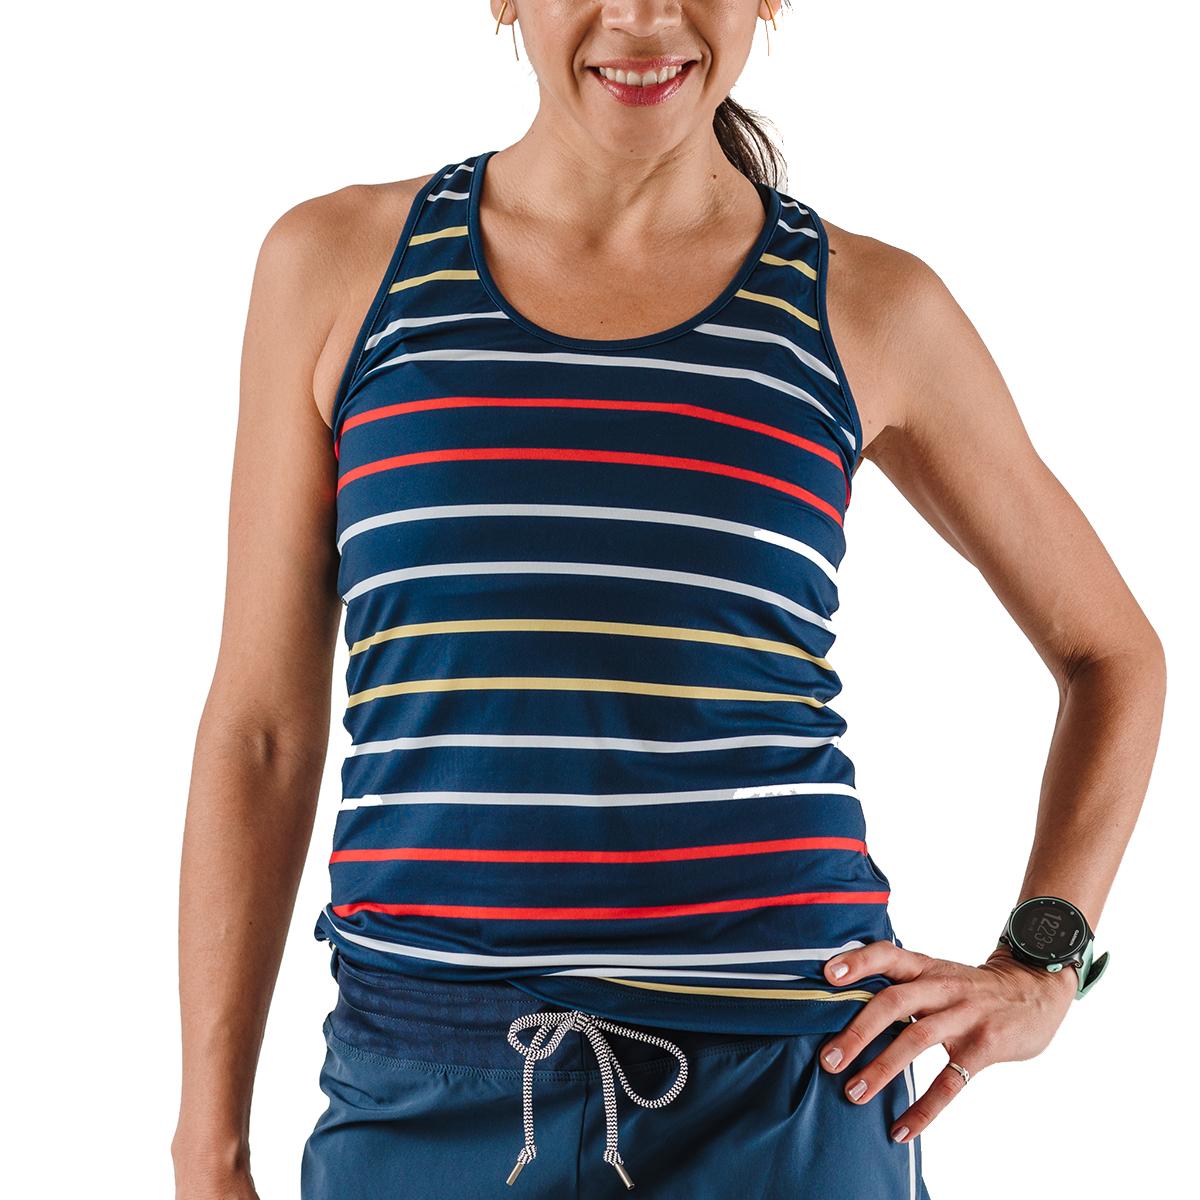 Women's Rabbit Bunny Hop Tank - Color: Dress Blues Stripe - Size: XS, Dress Blues Stripe, large, image 1